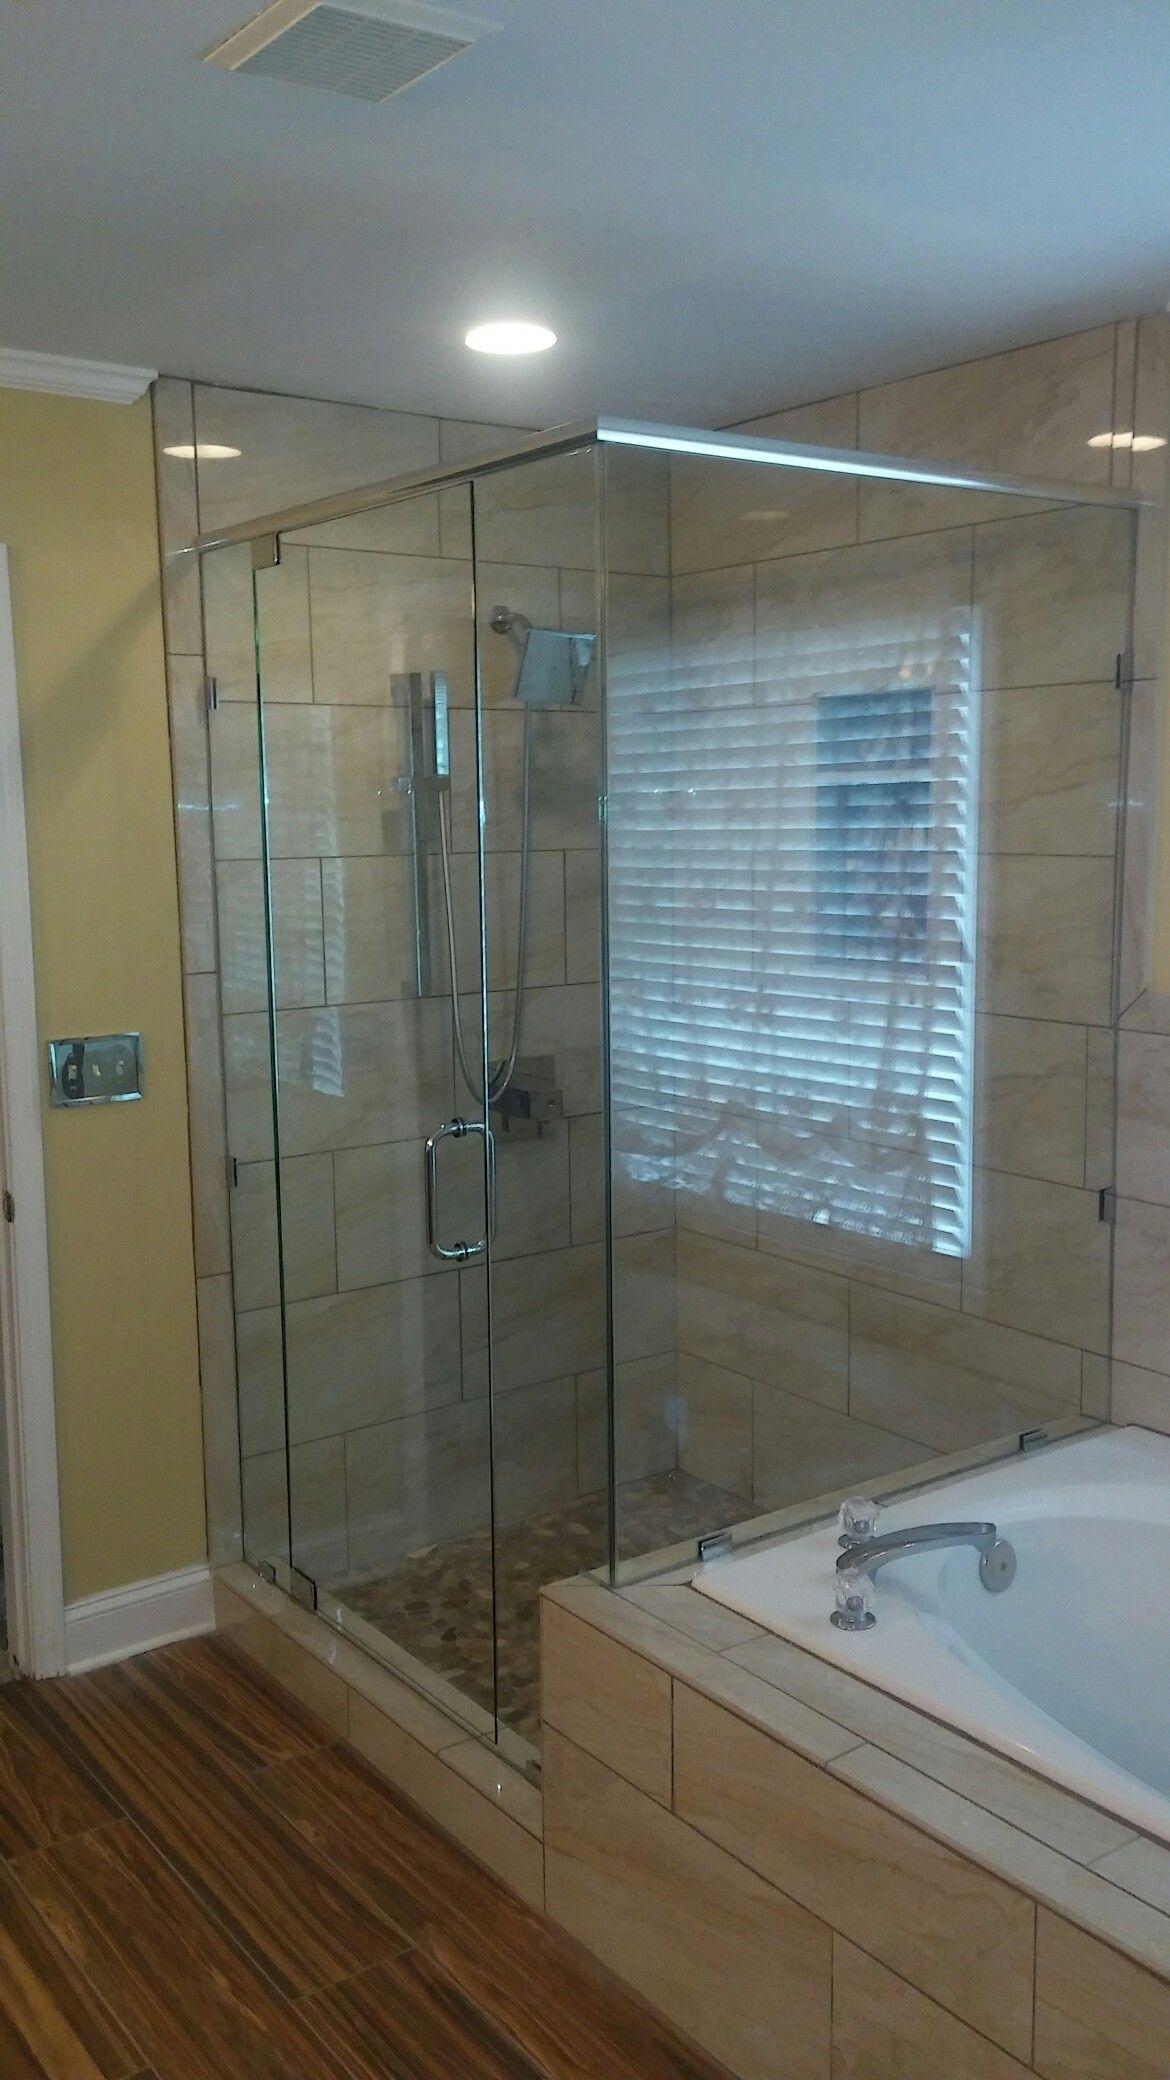 90 Frameless Shower Door With Header In Duluth Ga Get Your Free